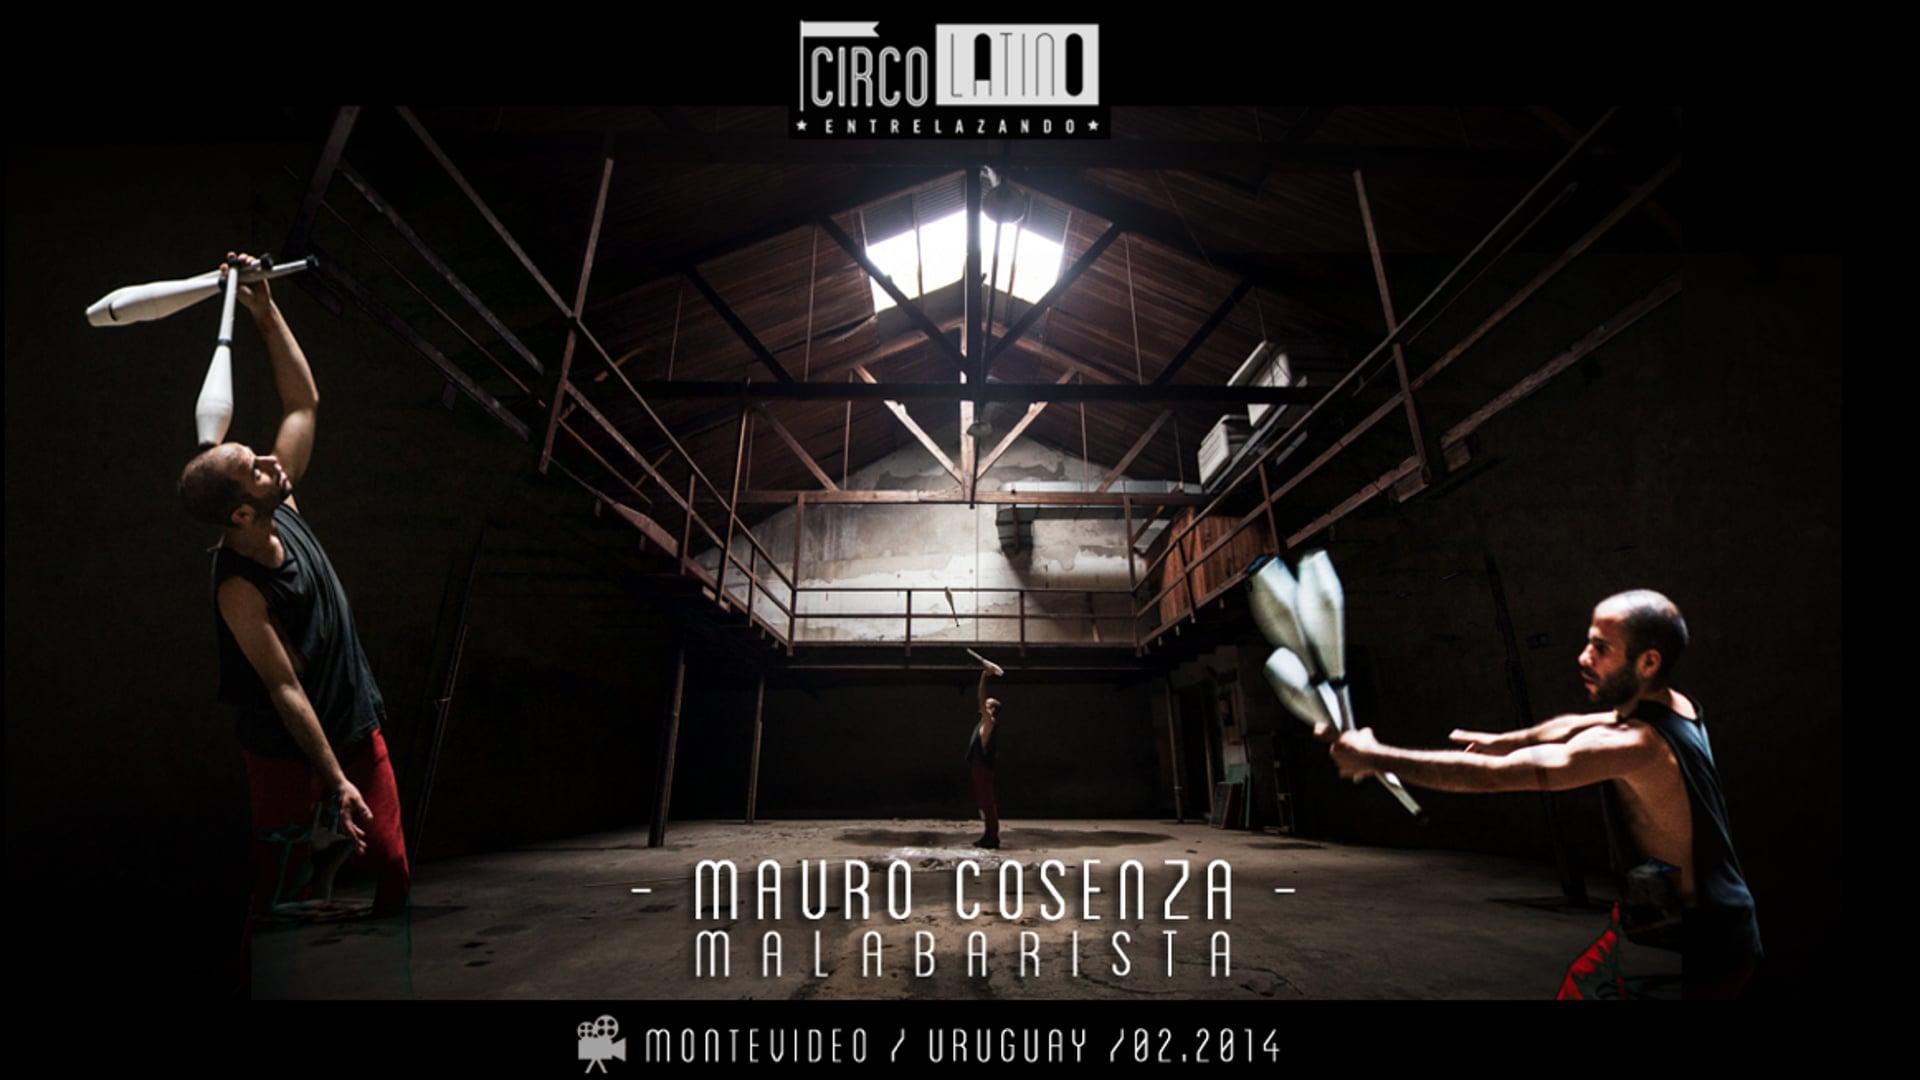 MAURO COSENZA // MALABAR // CIRCO LATINO URUGUAY